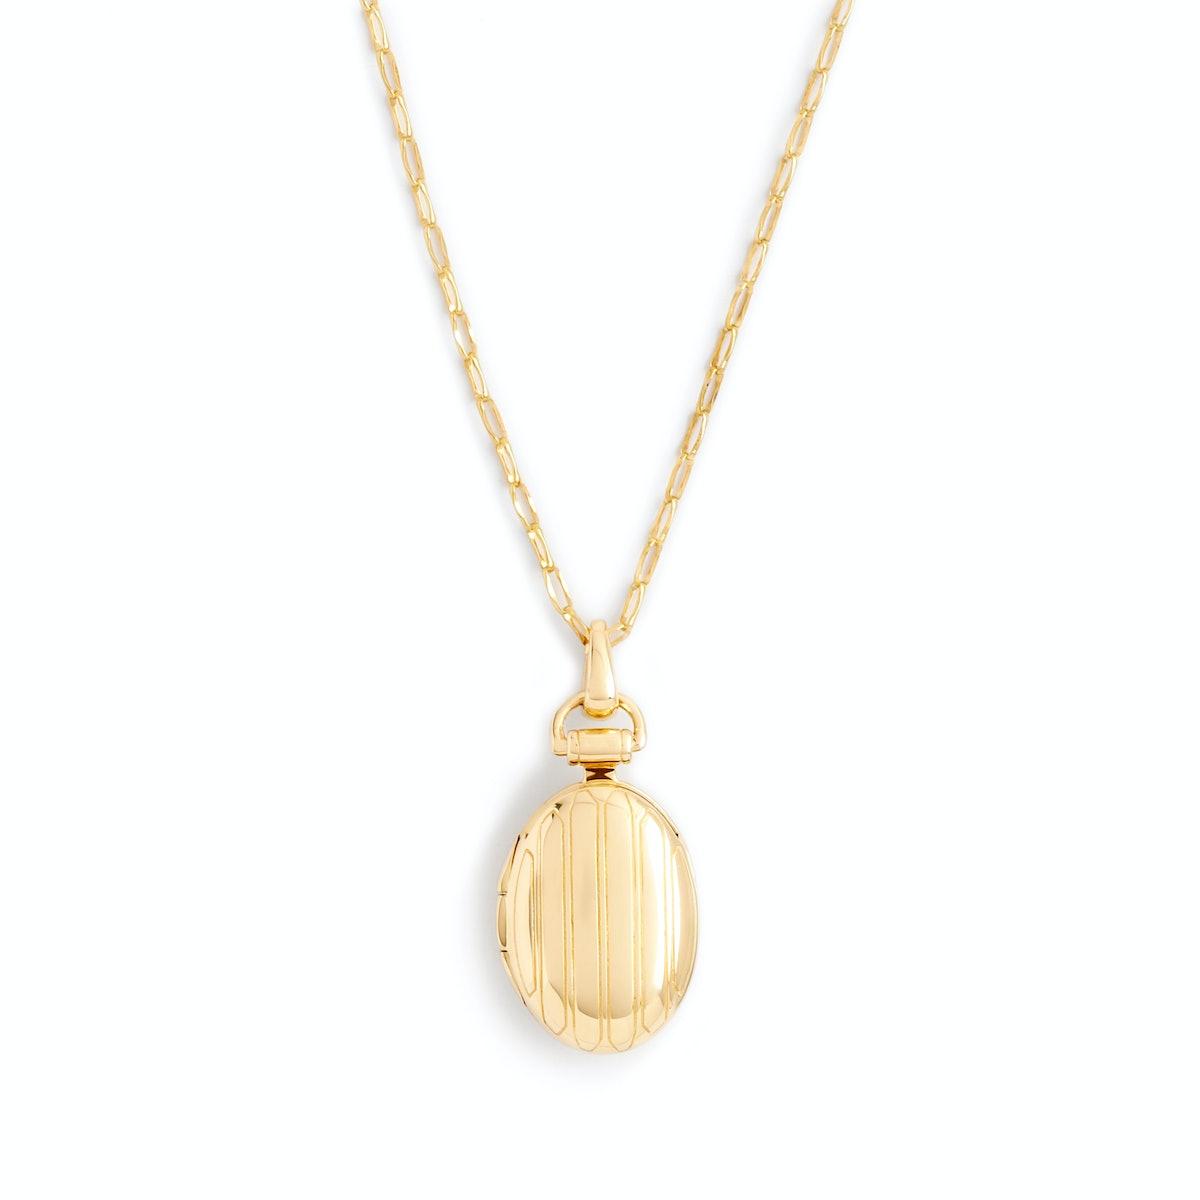 Monica Rich Kosann jewelry at J.Crew